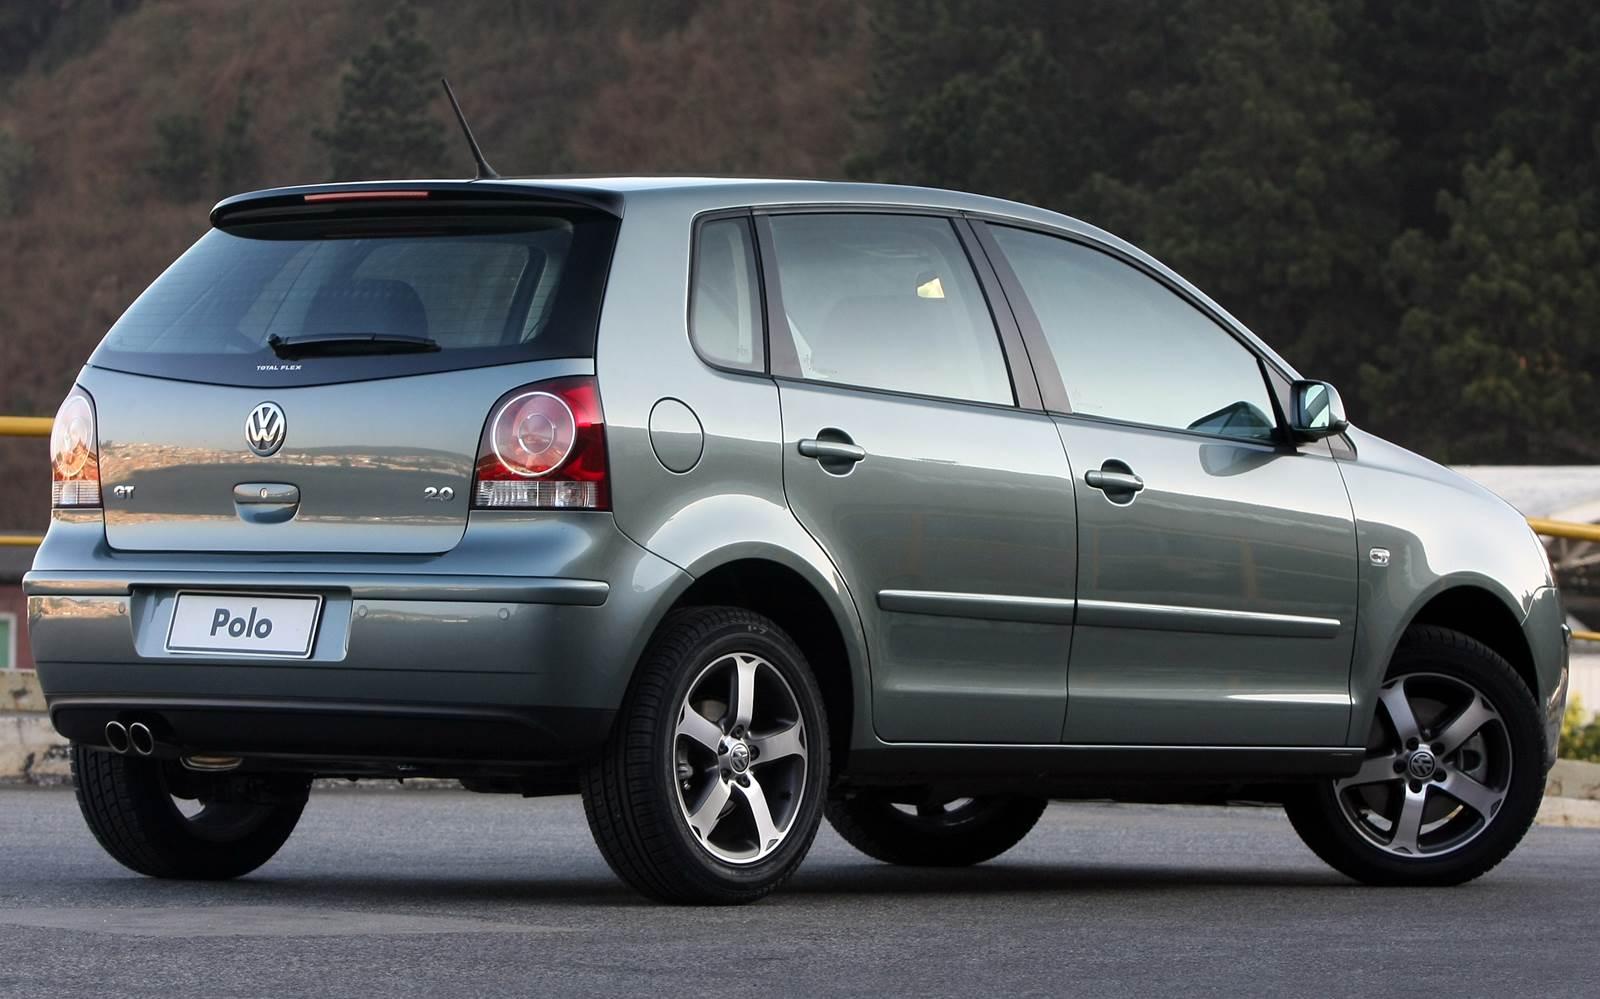 Used volkswagen citi alberton mitula cars - Carros Ten 10 Carro Volkswagen Gol Gera U00e7 U00e3o 6 Chegando Ao Mercado